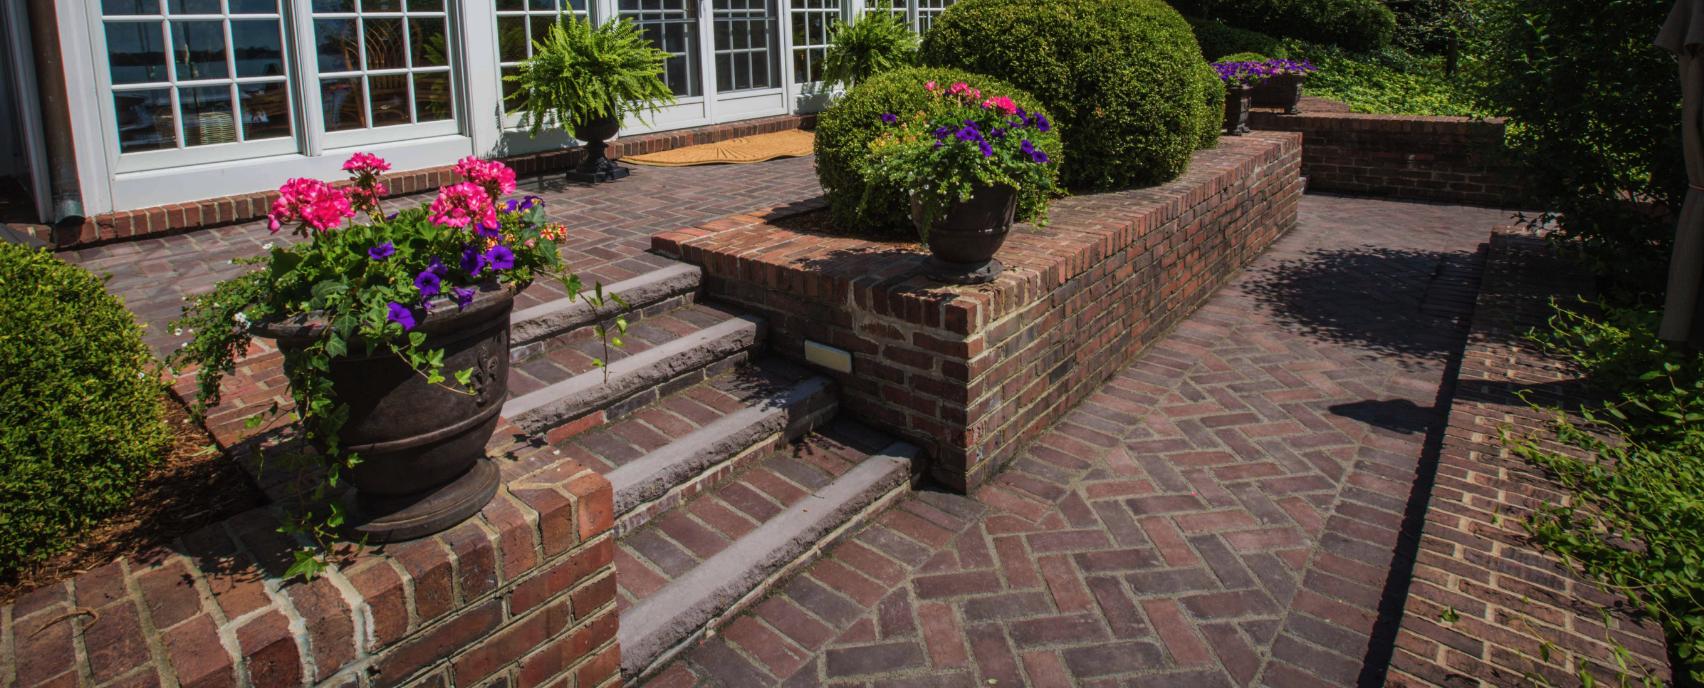 patio design ideas using concrete pavers for big backyard style